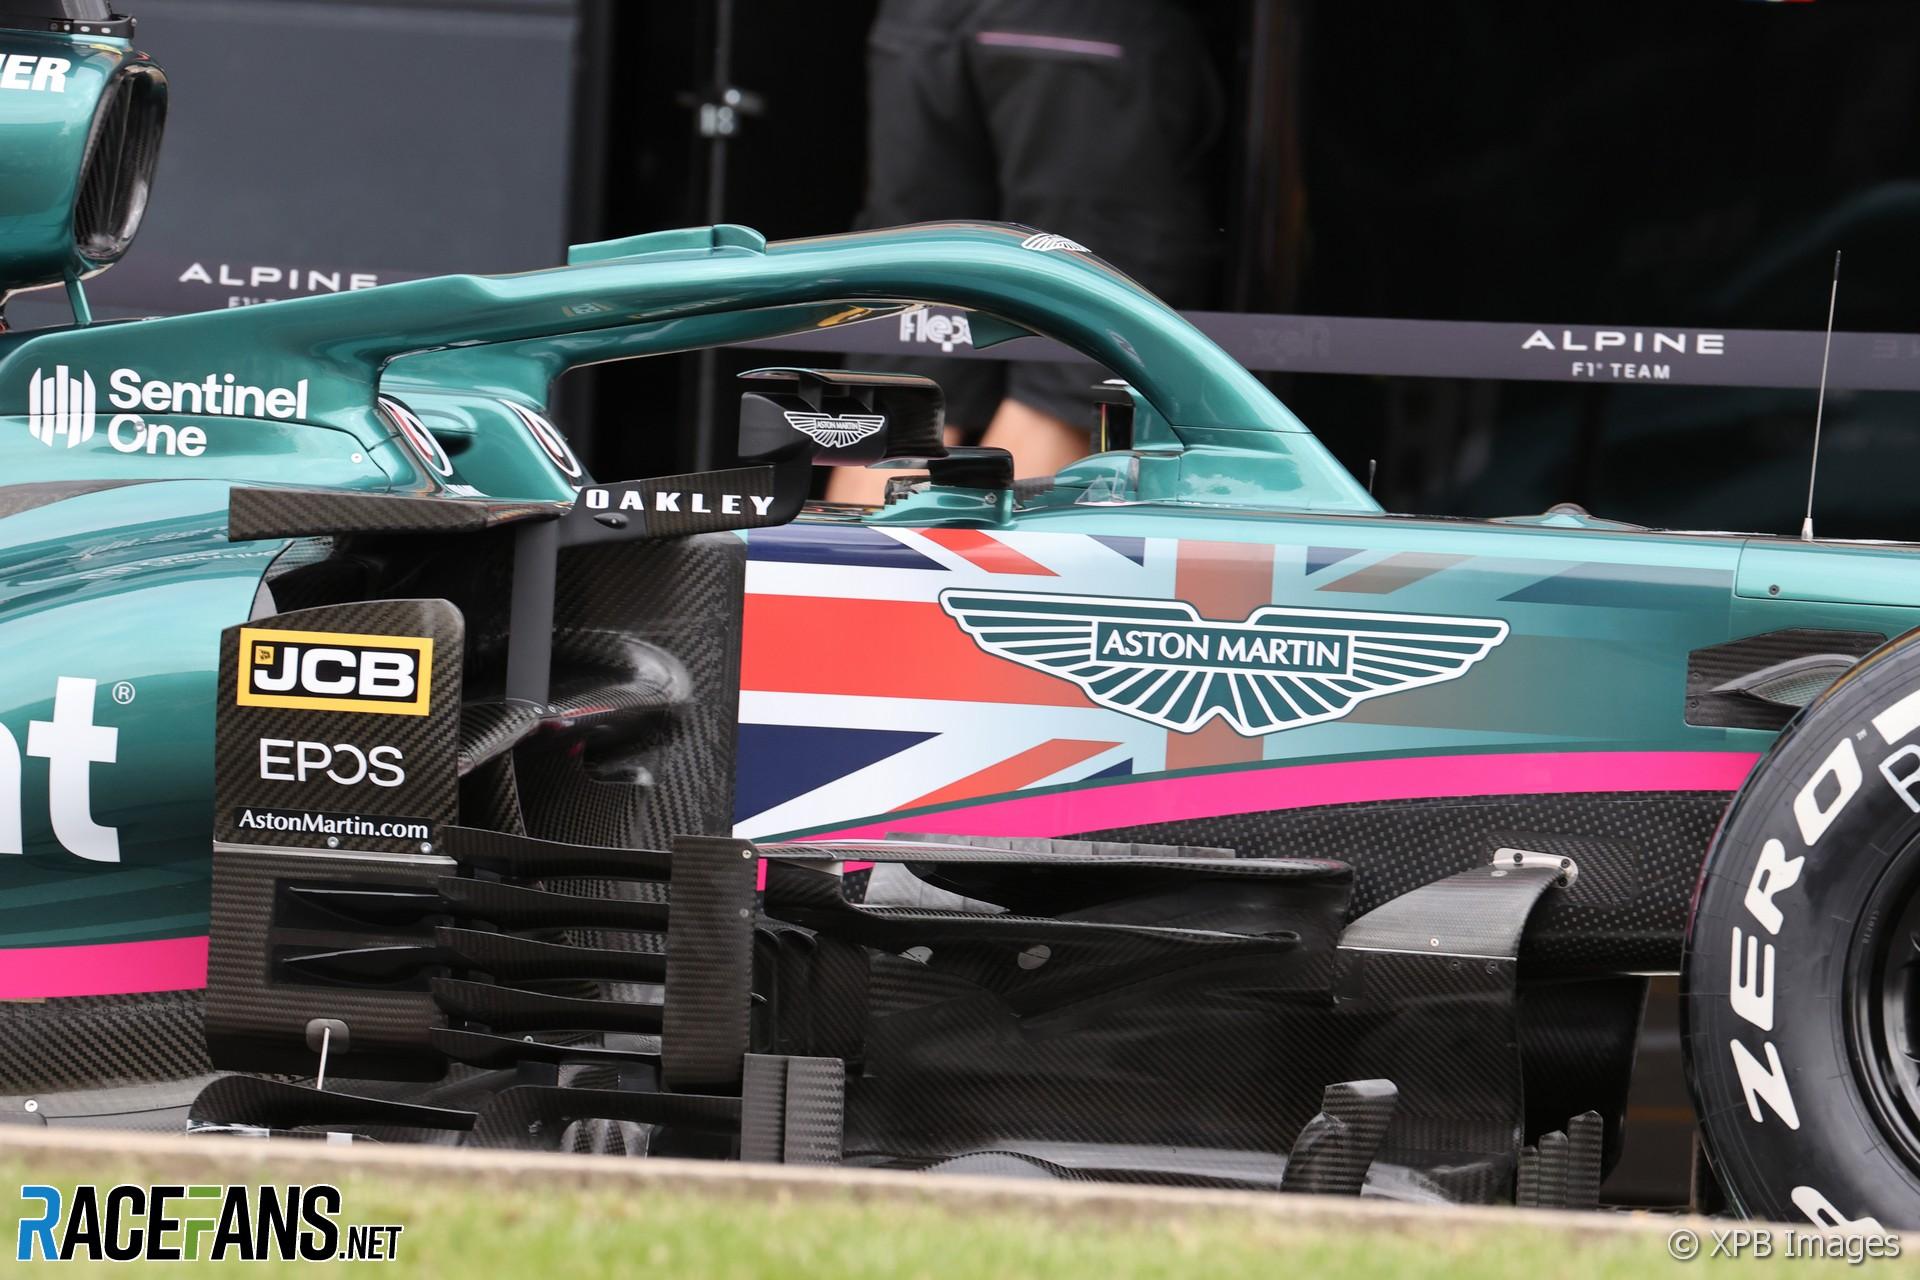 Aston Martin, Silverstone, 2021